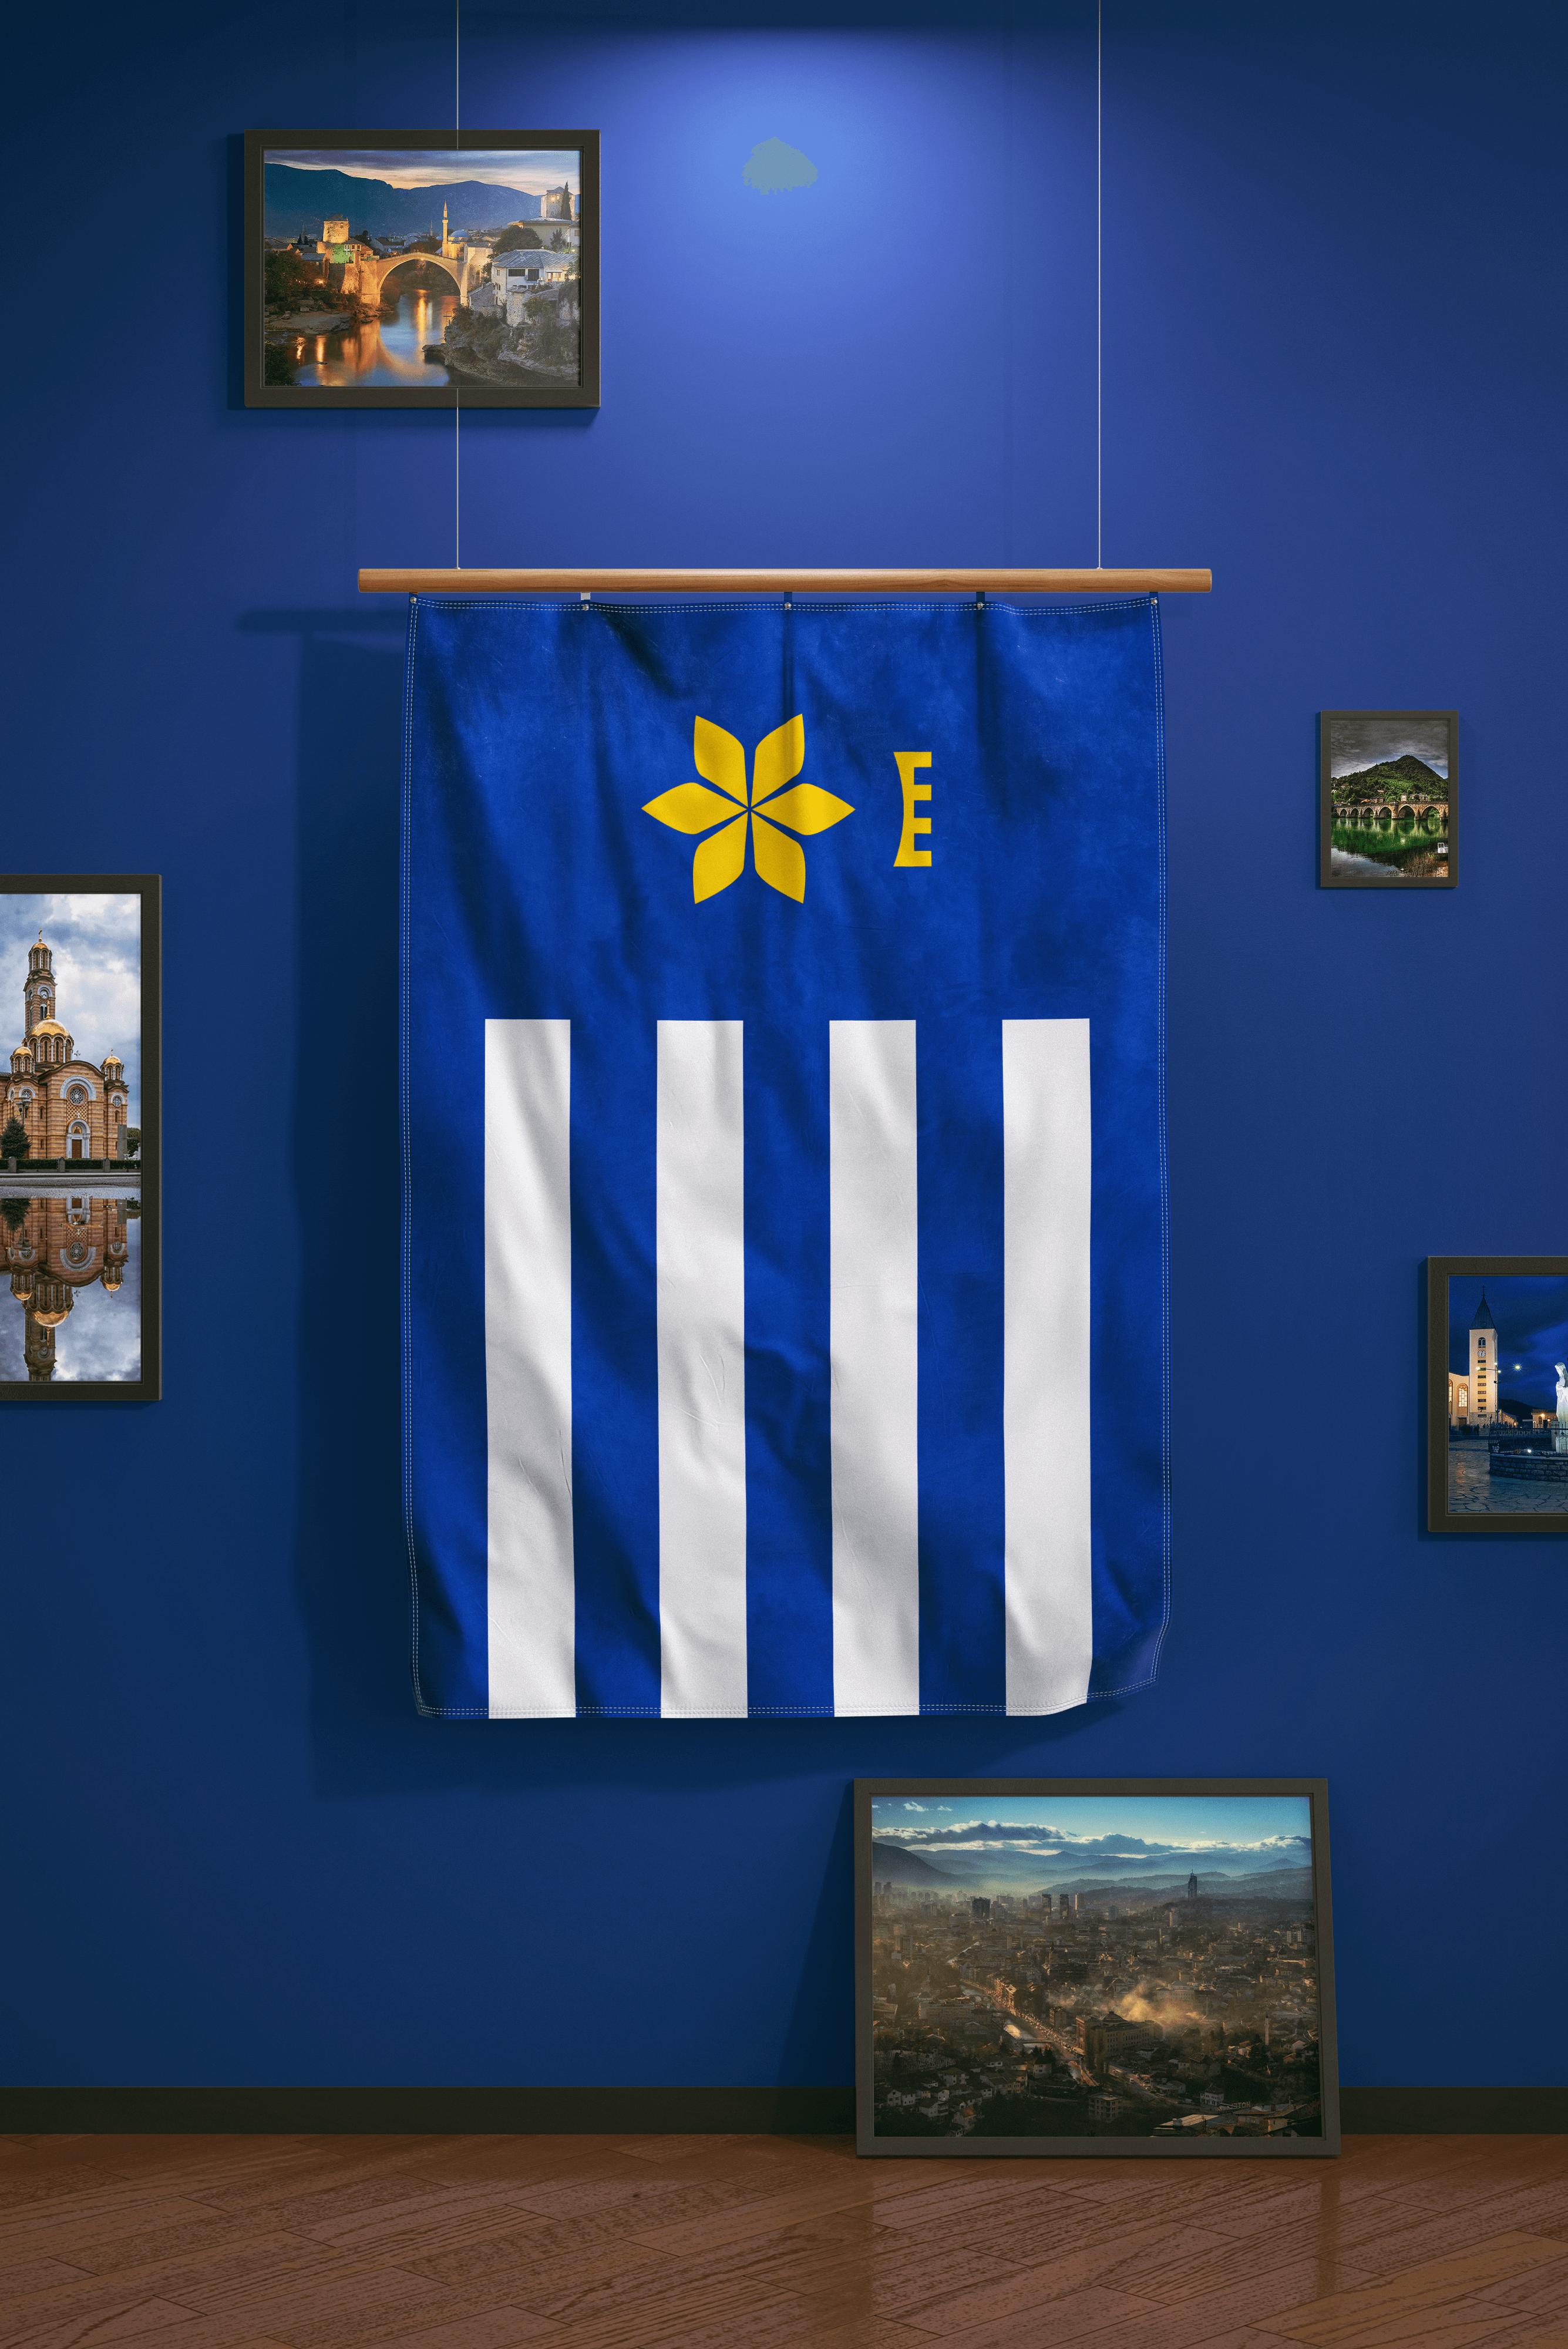 heysuho-denissuhopoljac-bih-flag-2019-Scene-7(flag)